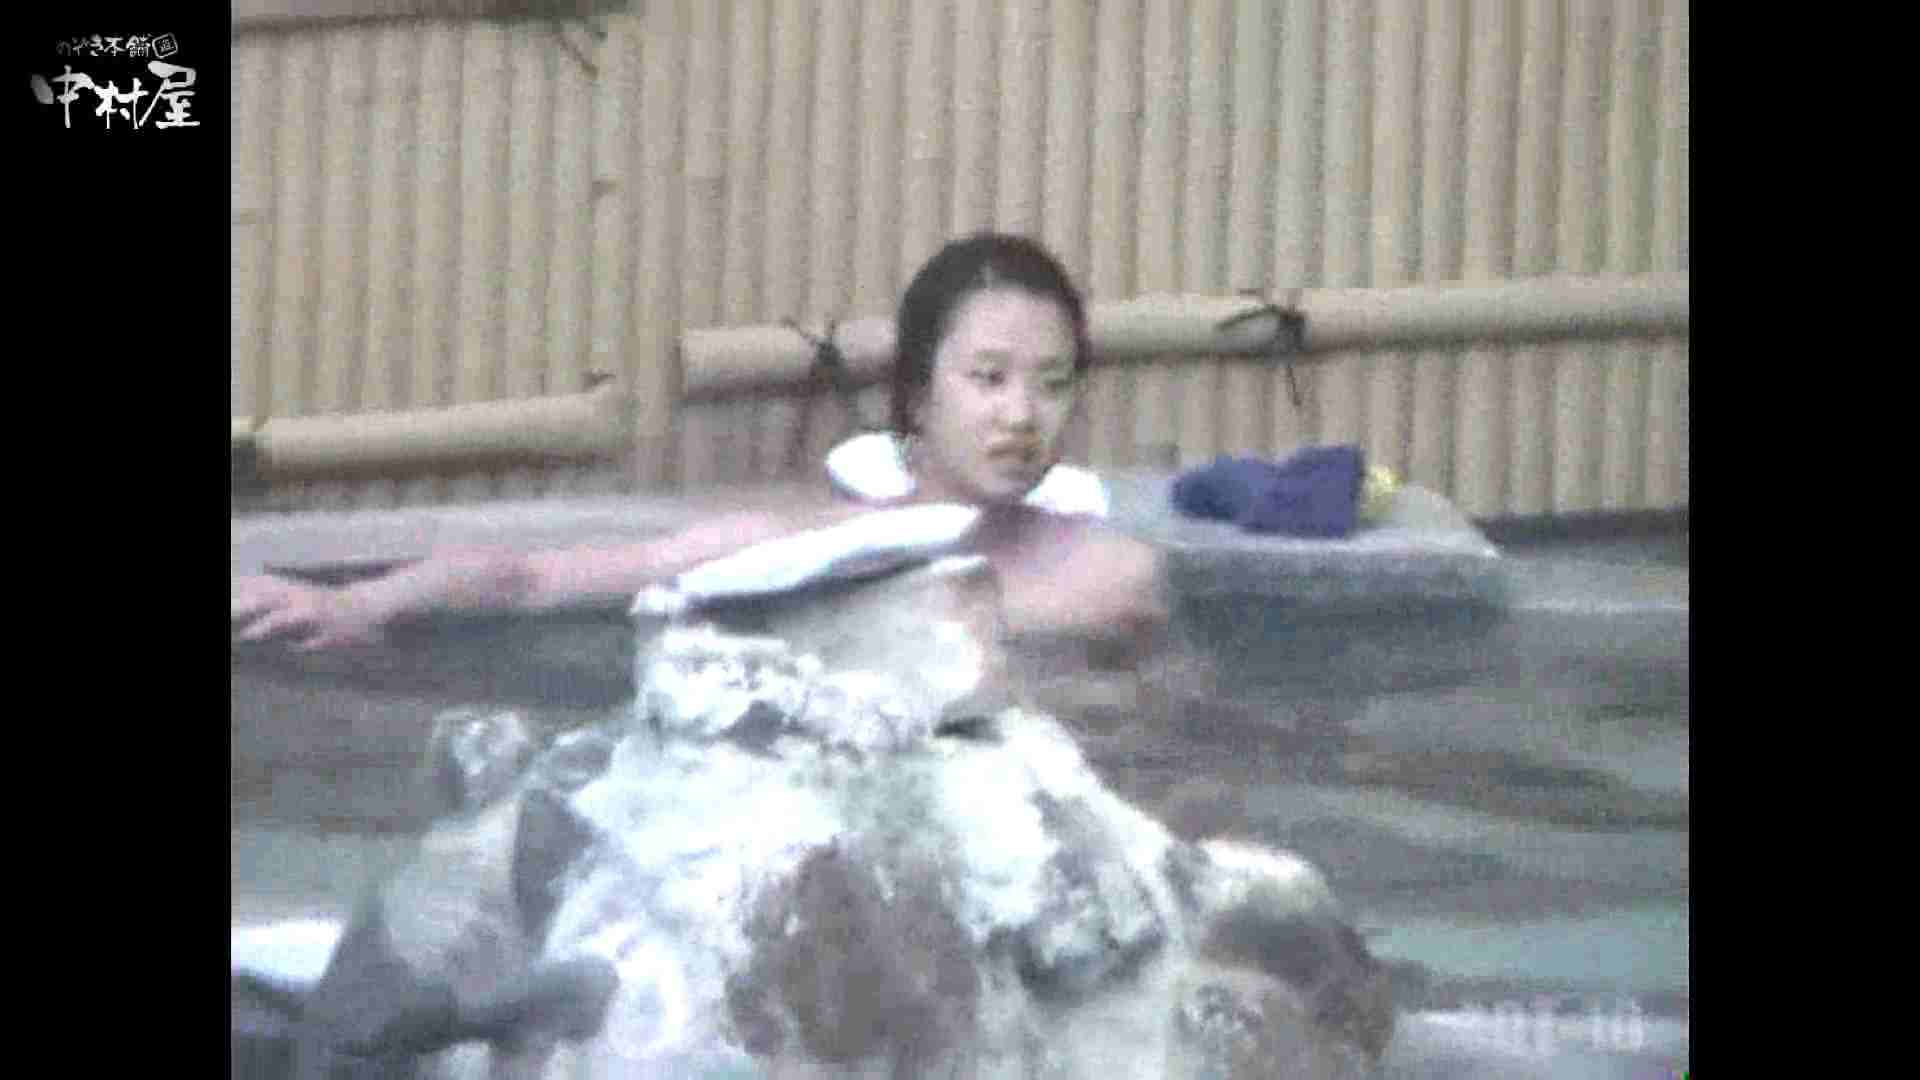 Aquaな露天風呂Vol.874潜入盗撮露天風呂十判湯 其の二 潜入突撃 オマンコ動画キャプチャ 90pic 59